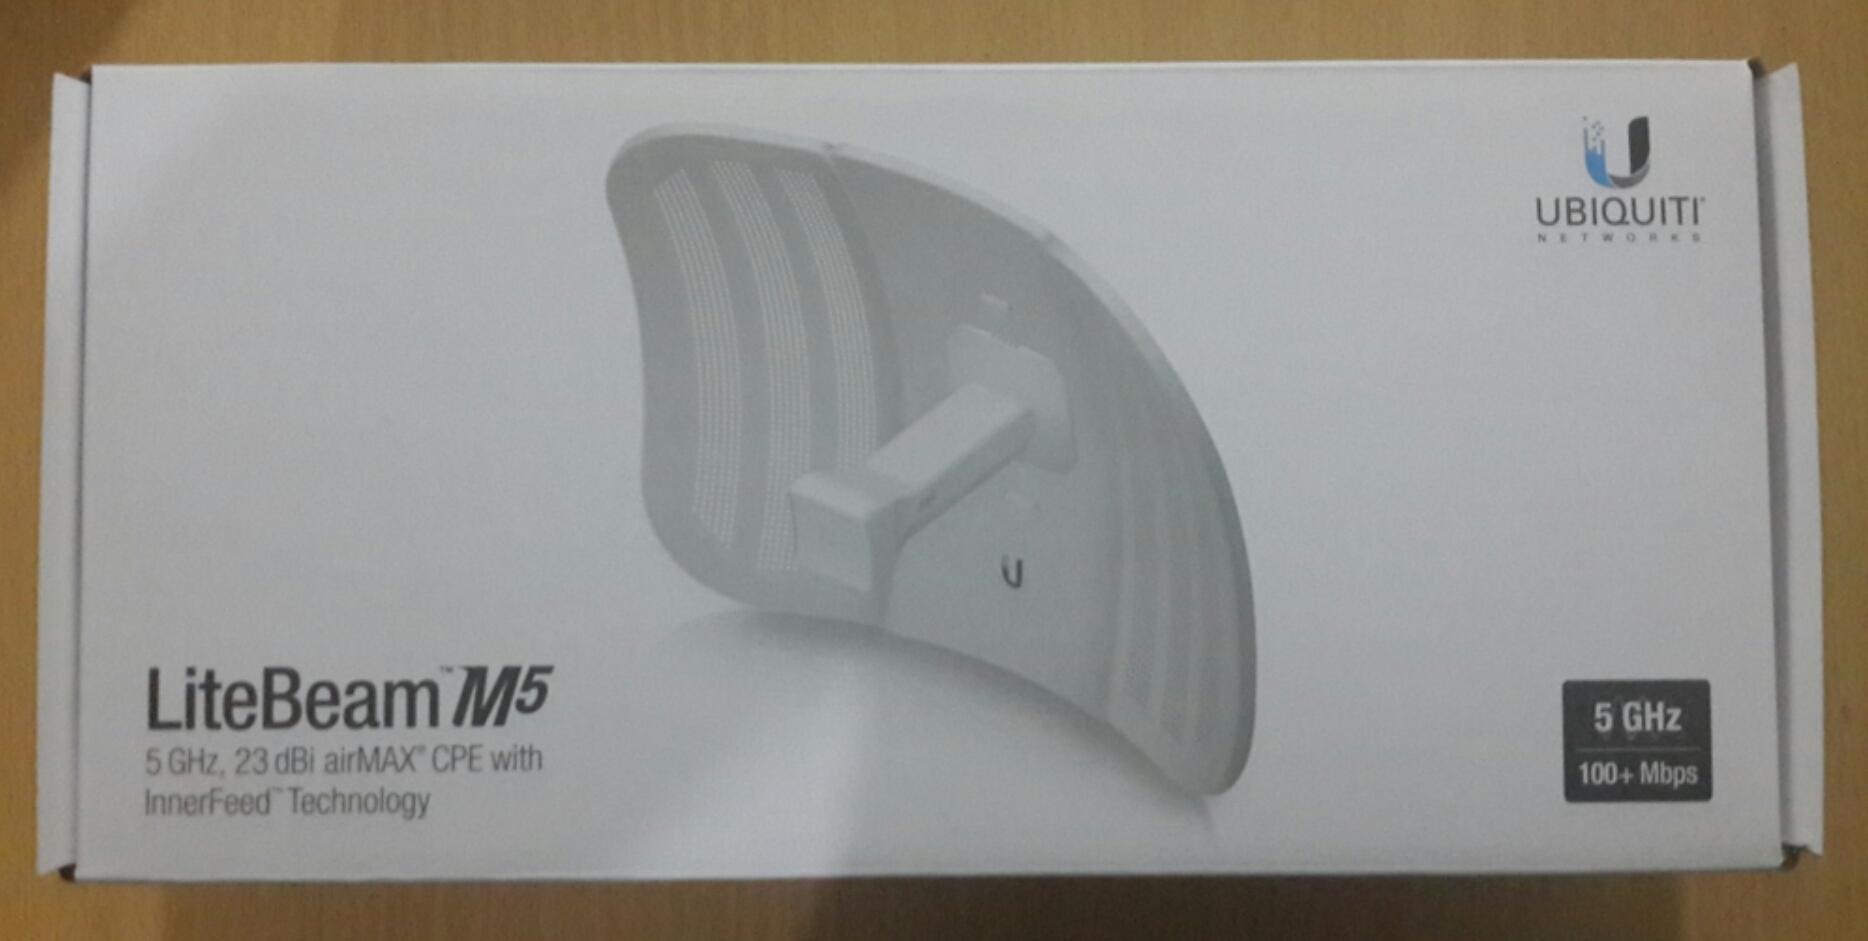 Jual Ubiquiti Litebeam M5 23 Lbe Silicon Net Tokopedia 23dbi